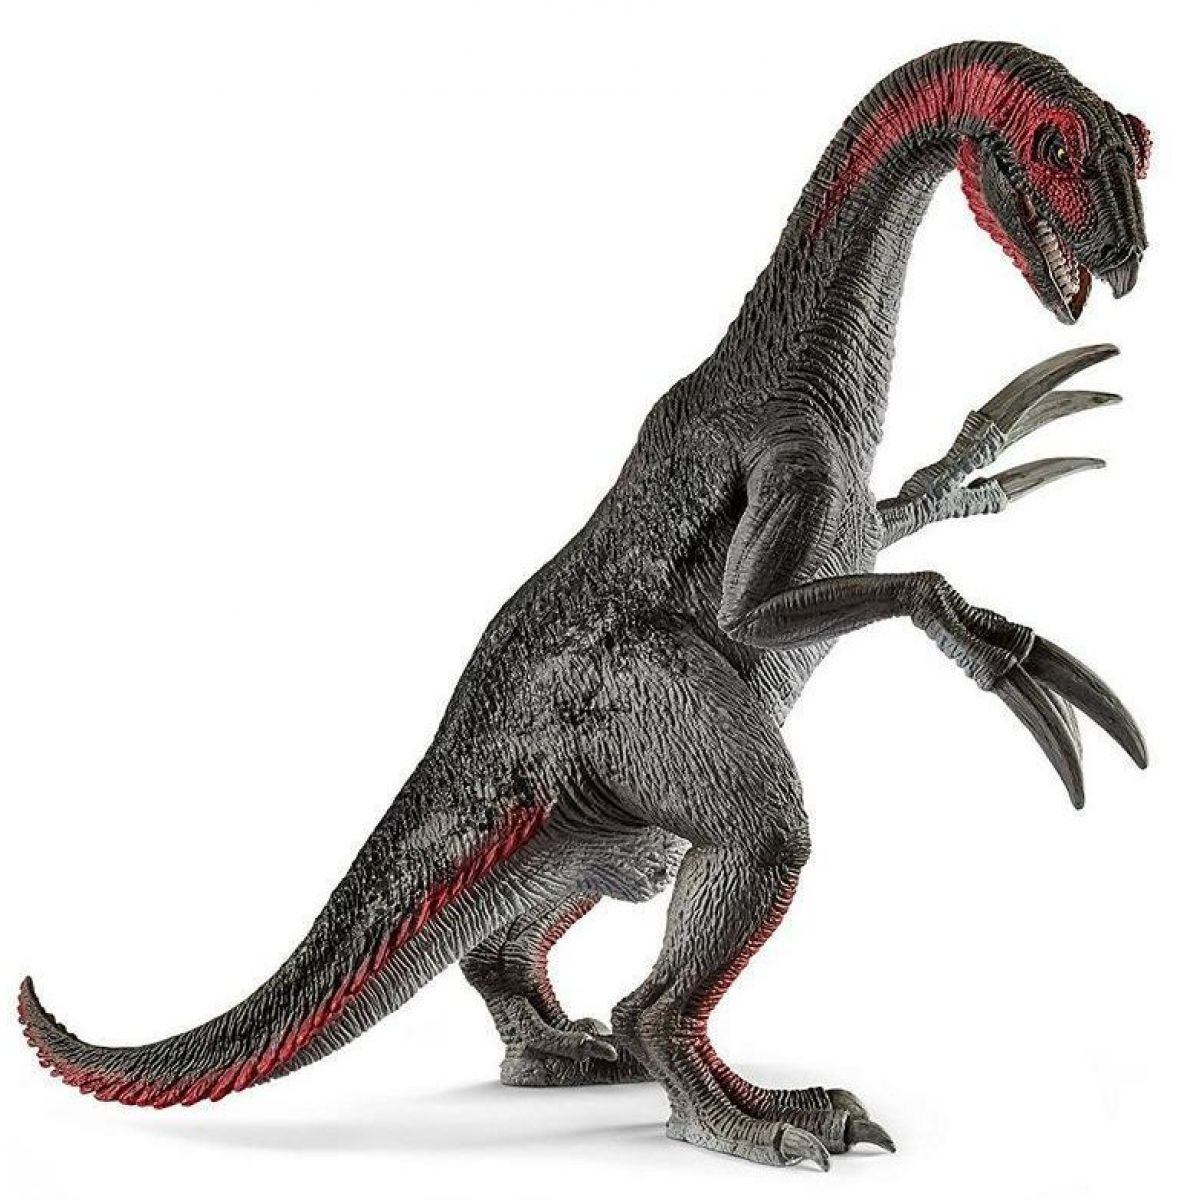 Schleich 15003 Prehistorické zvířátko Therizinosaurus